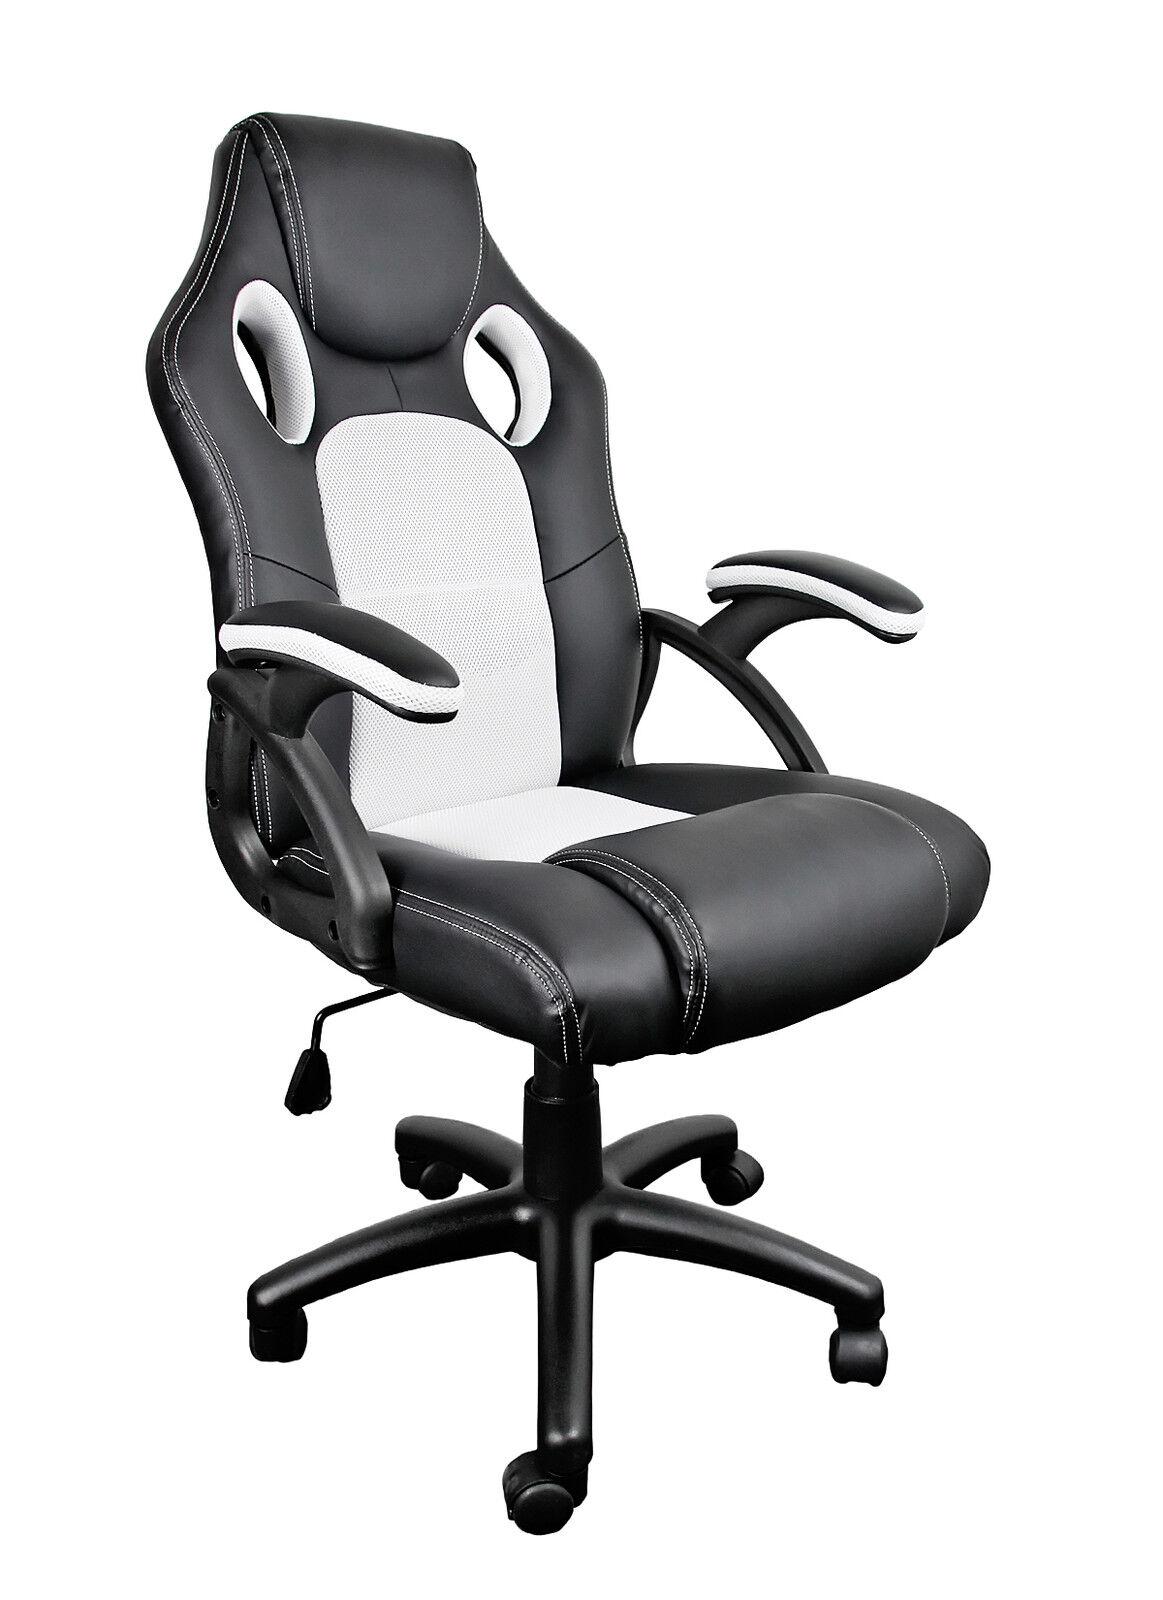 Racing Sport Bucket Computer Desk Gaming Office Chair Seat